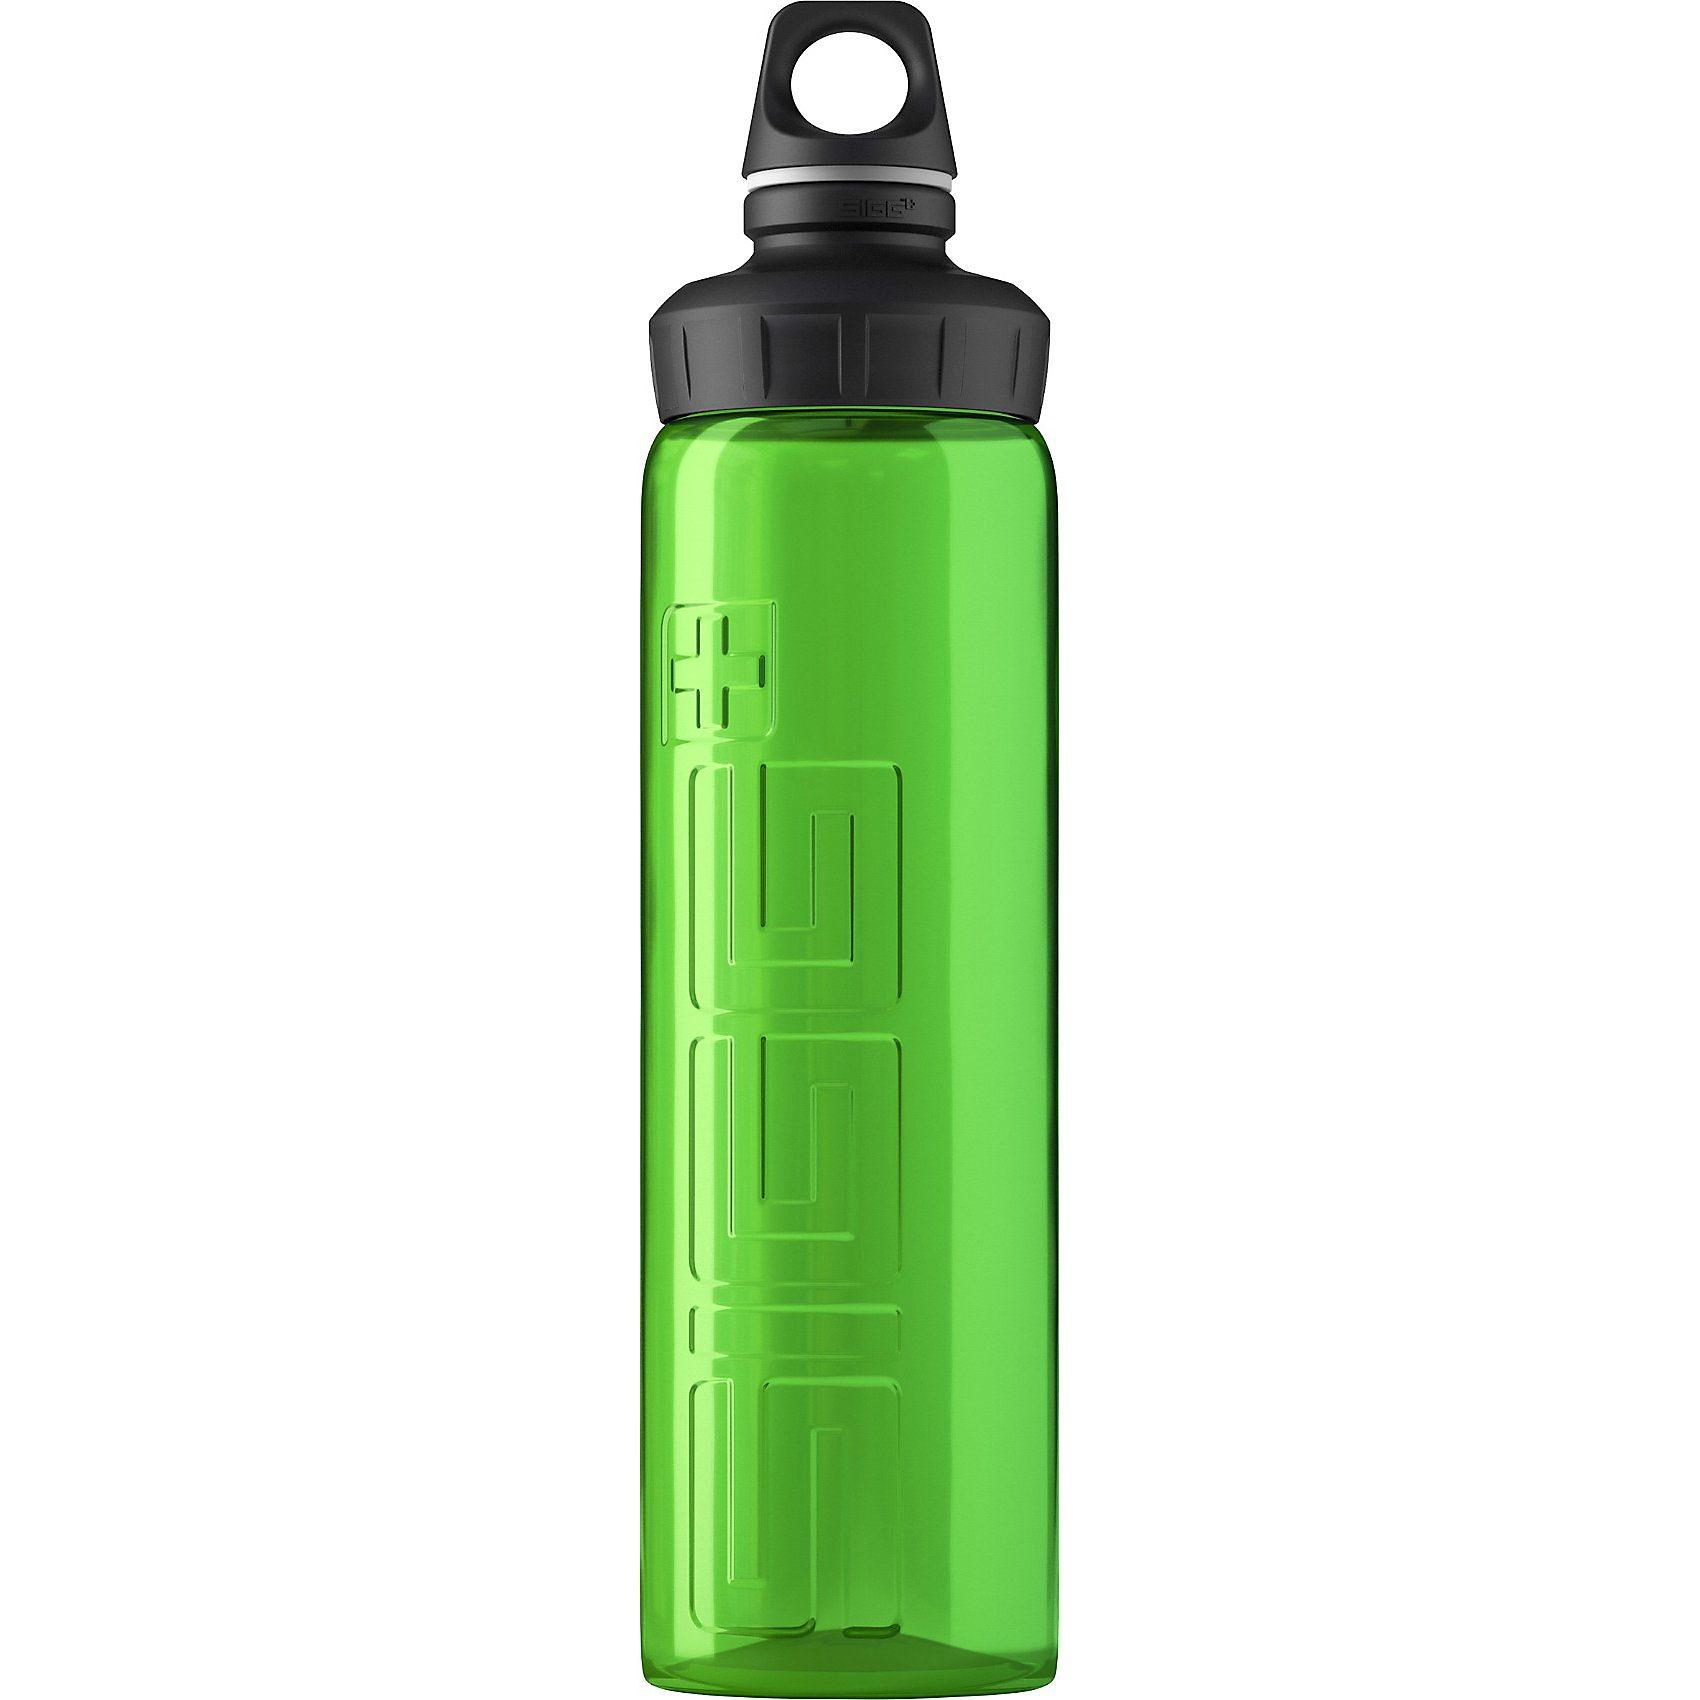 SIGG Trinkflasche VIVA Green transpareent, 750 ml